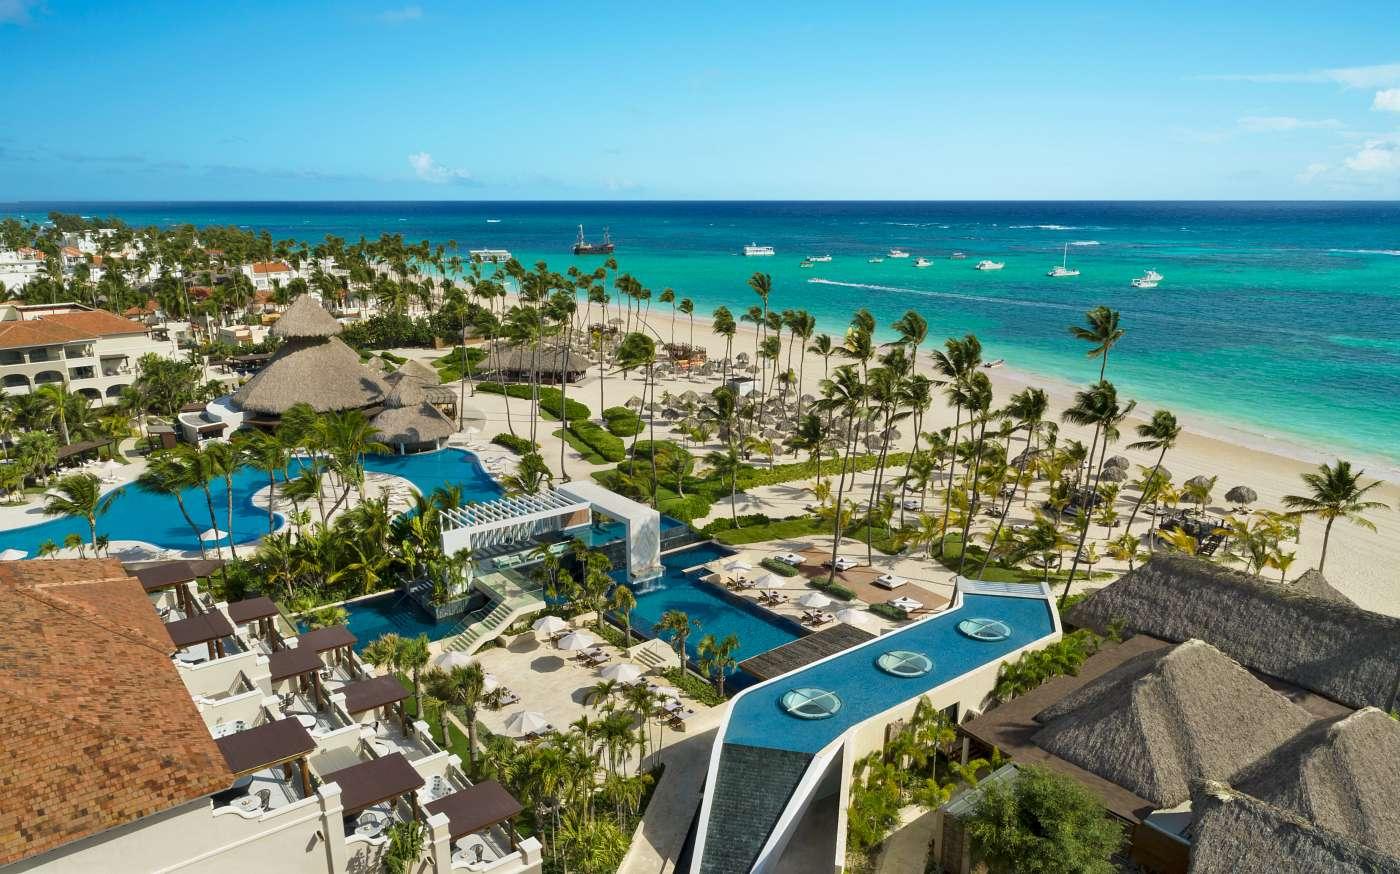 Aeirla image of white sand beach and swimming pools